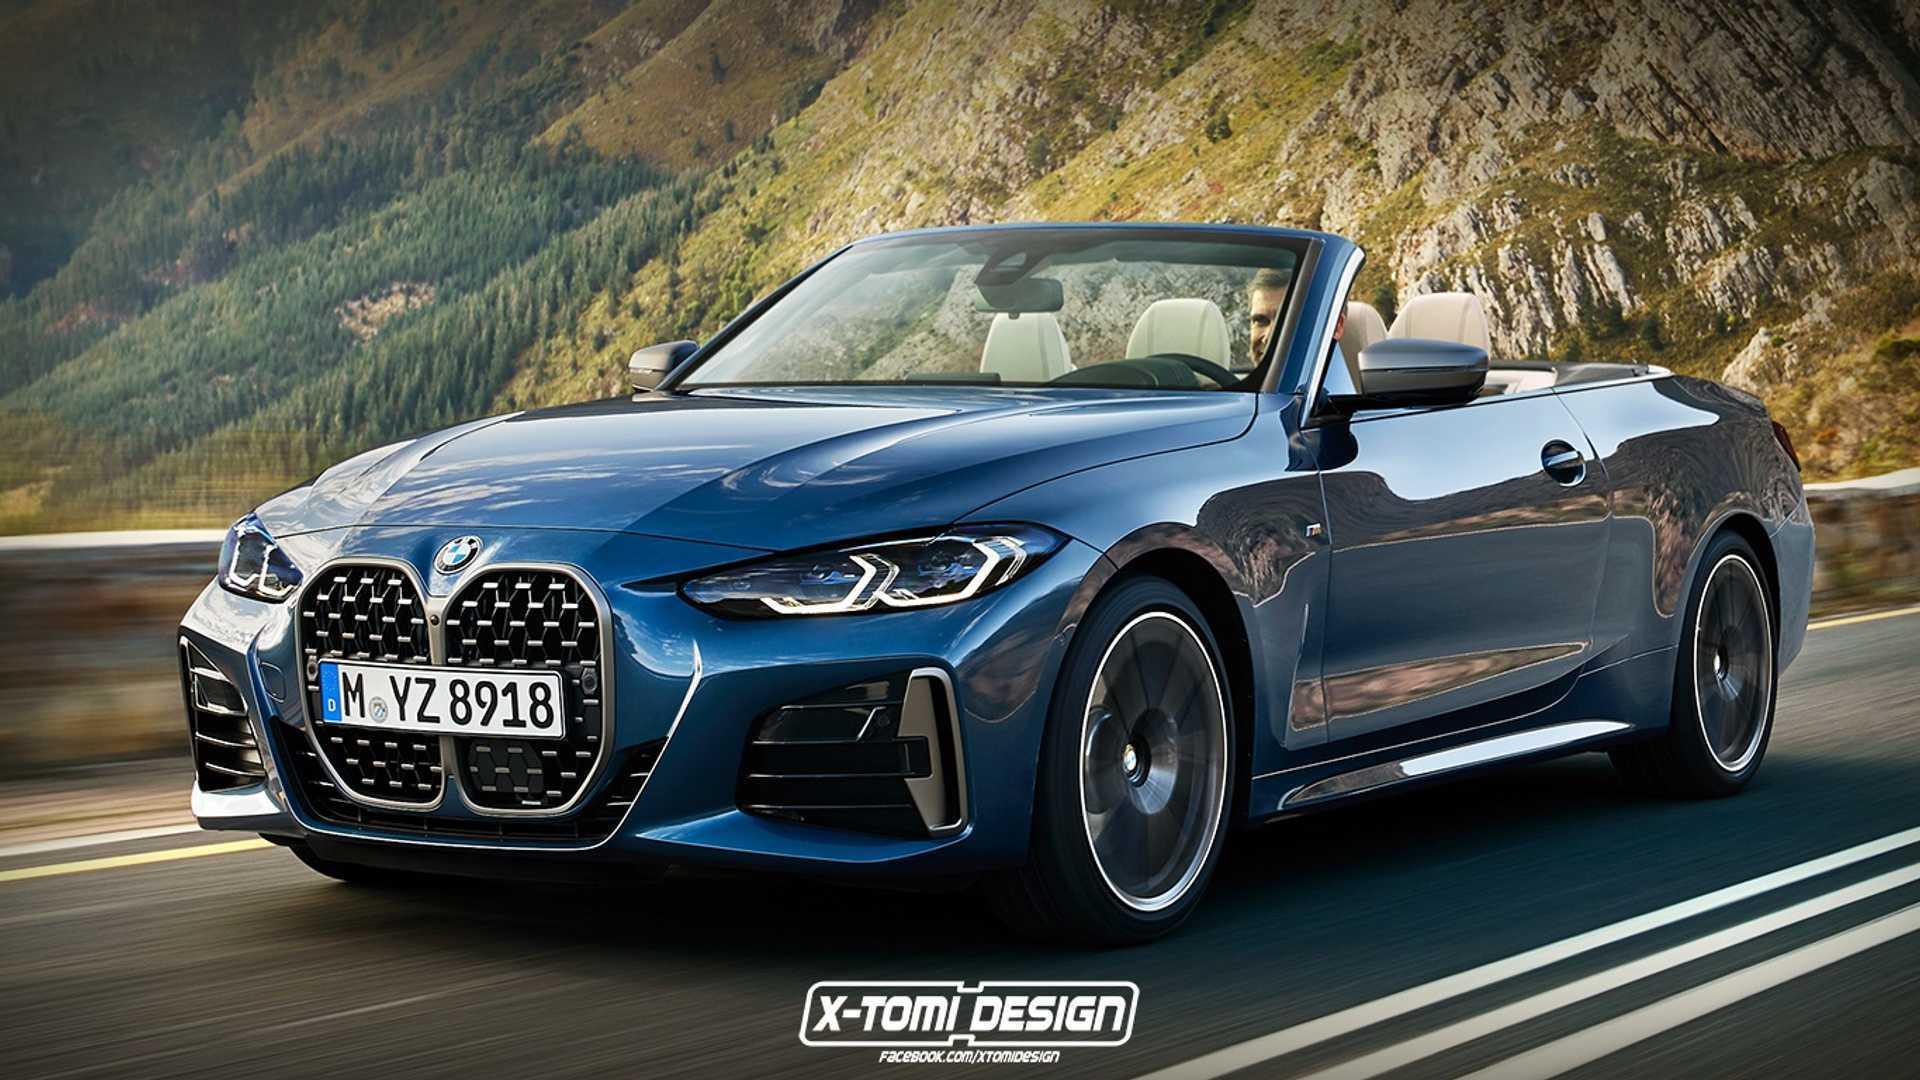 2020 - [BMW] Série 4 Coupé/Cabriolet G23-G22 - Page 12 Bmw-4-series-cabrio-rendering